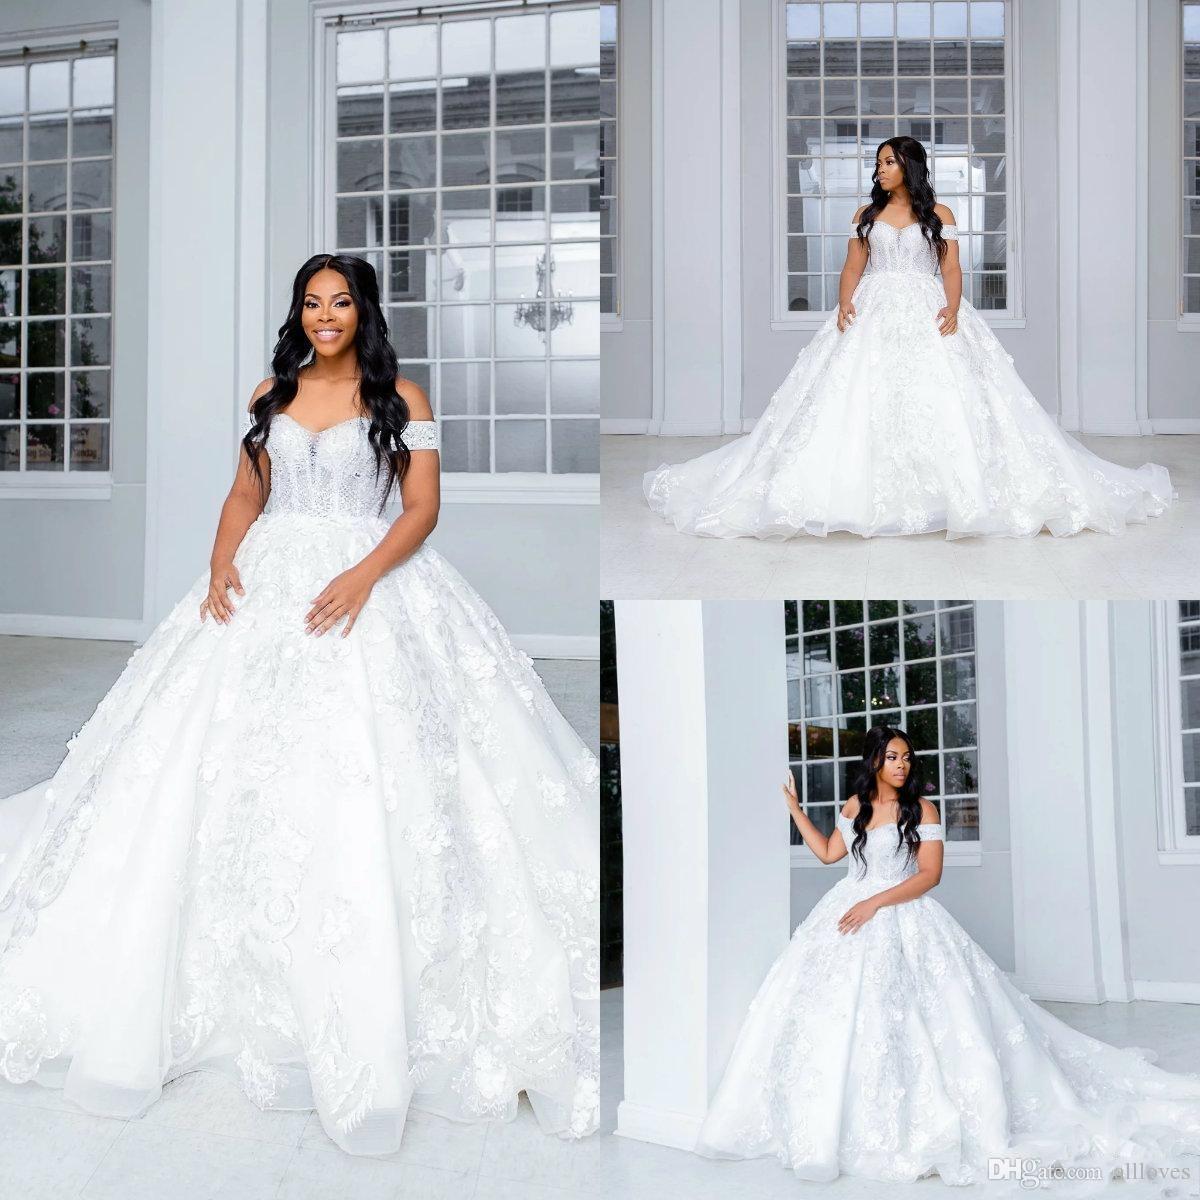 2020 Taille Taille Robe de mariée Africaine Robe De Mariée Sexy Off Off Off Of Floral Appliques Bridal Robe Jour Train Vestidos de Novia AL5704